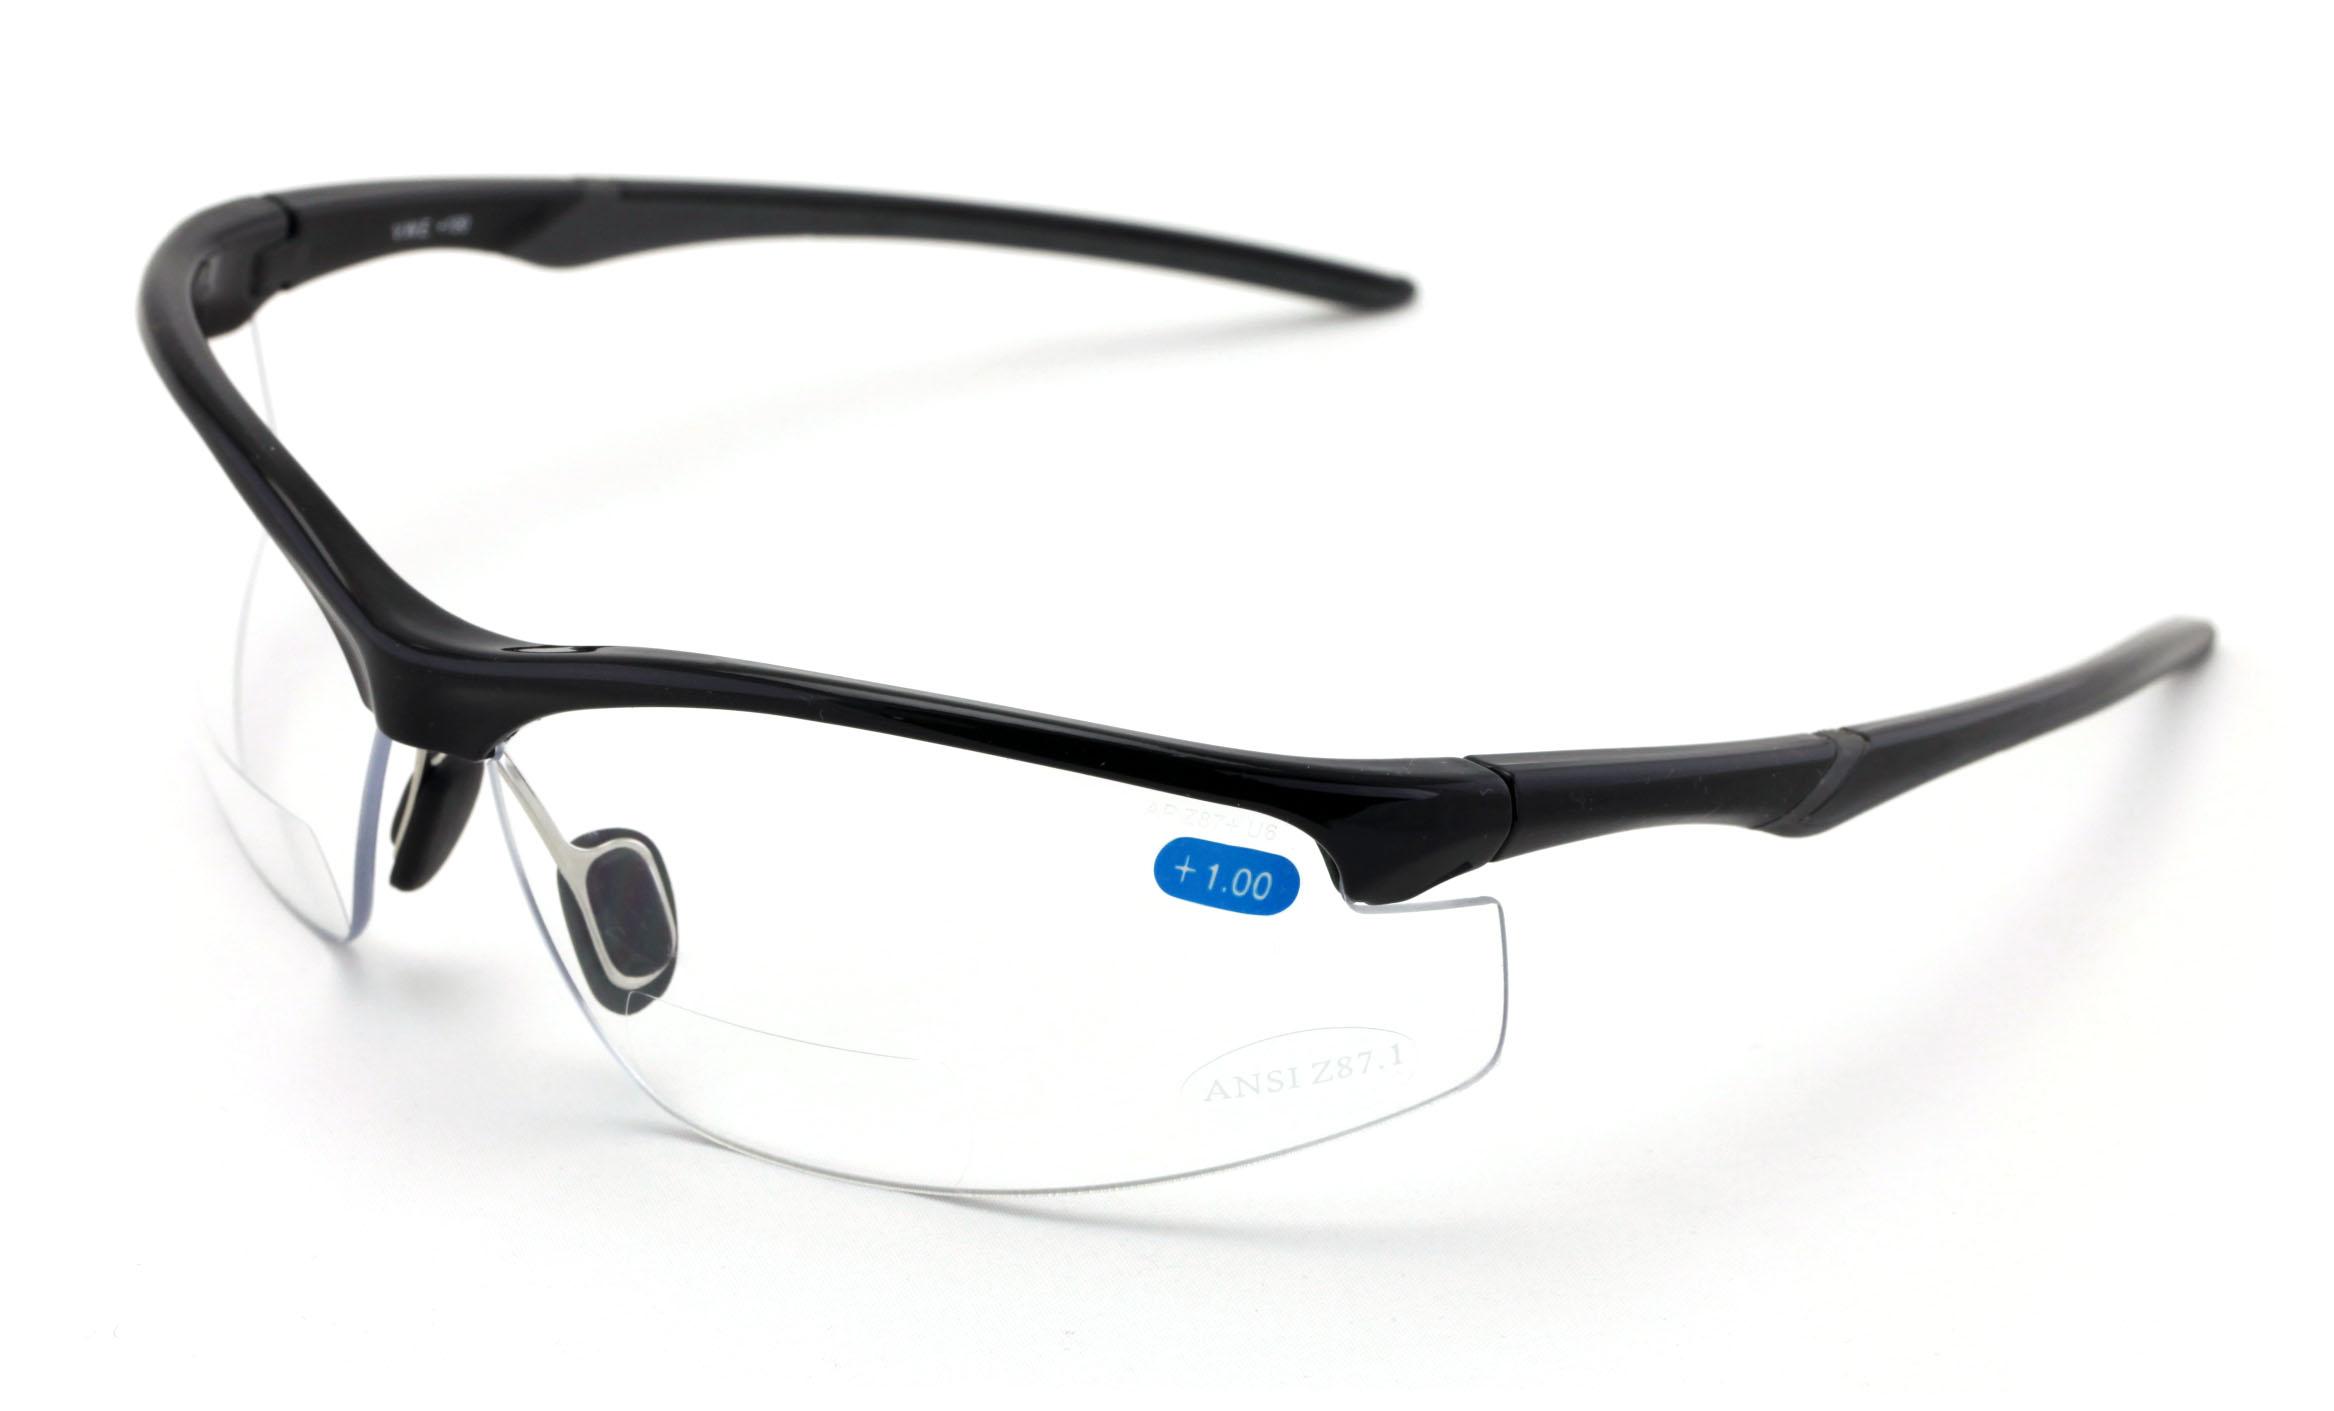 V.W.E. Bifocal Safety Glasses